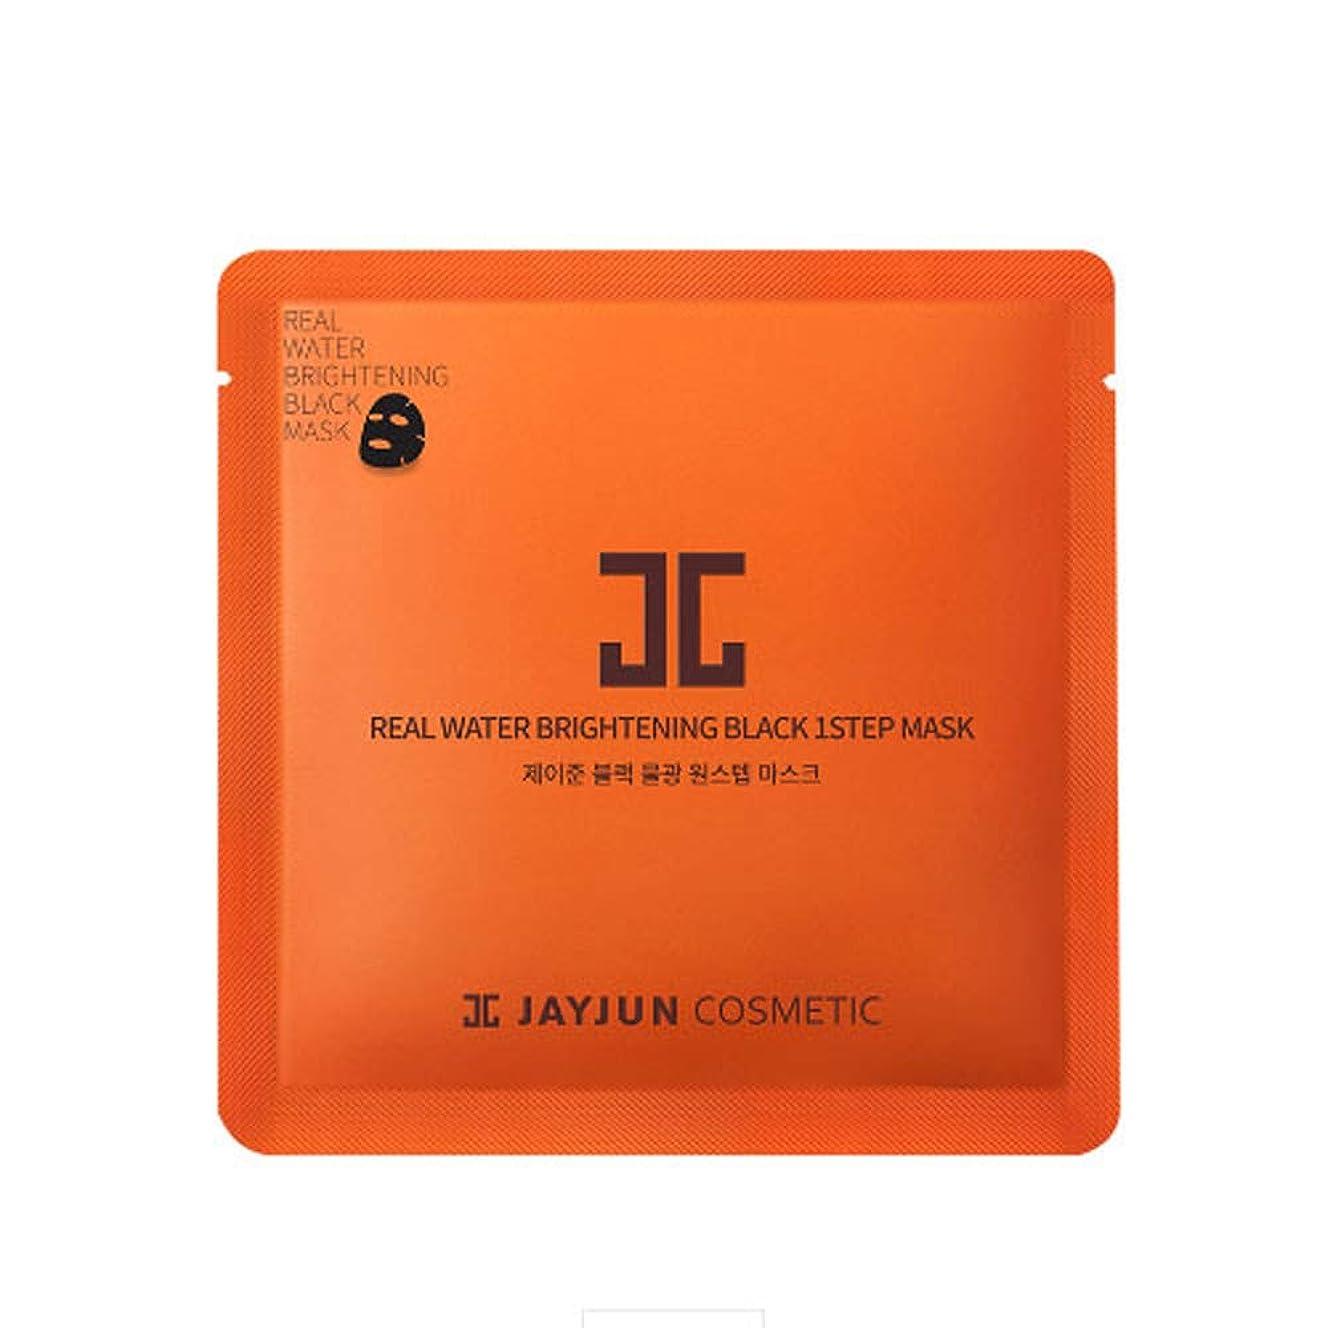 Jayjun(ジェイジュン) ブラックツヤ感(ムルガン)ワンステップマスク5枚セット